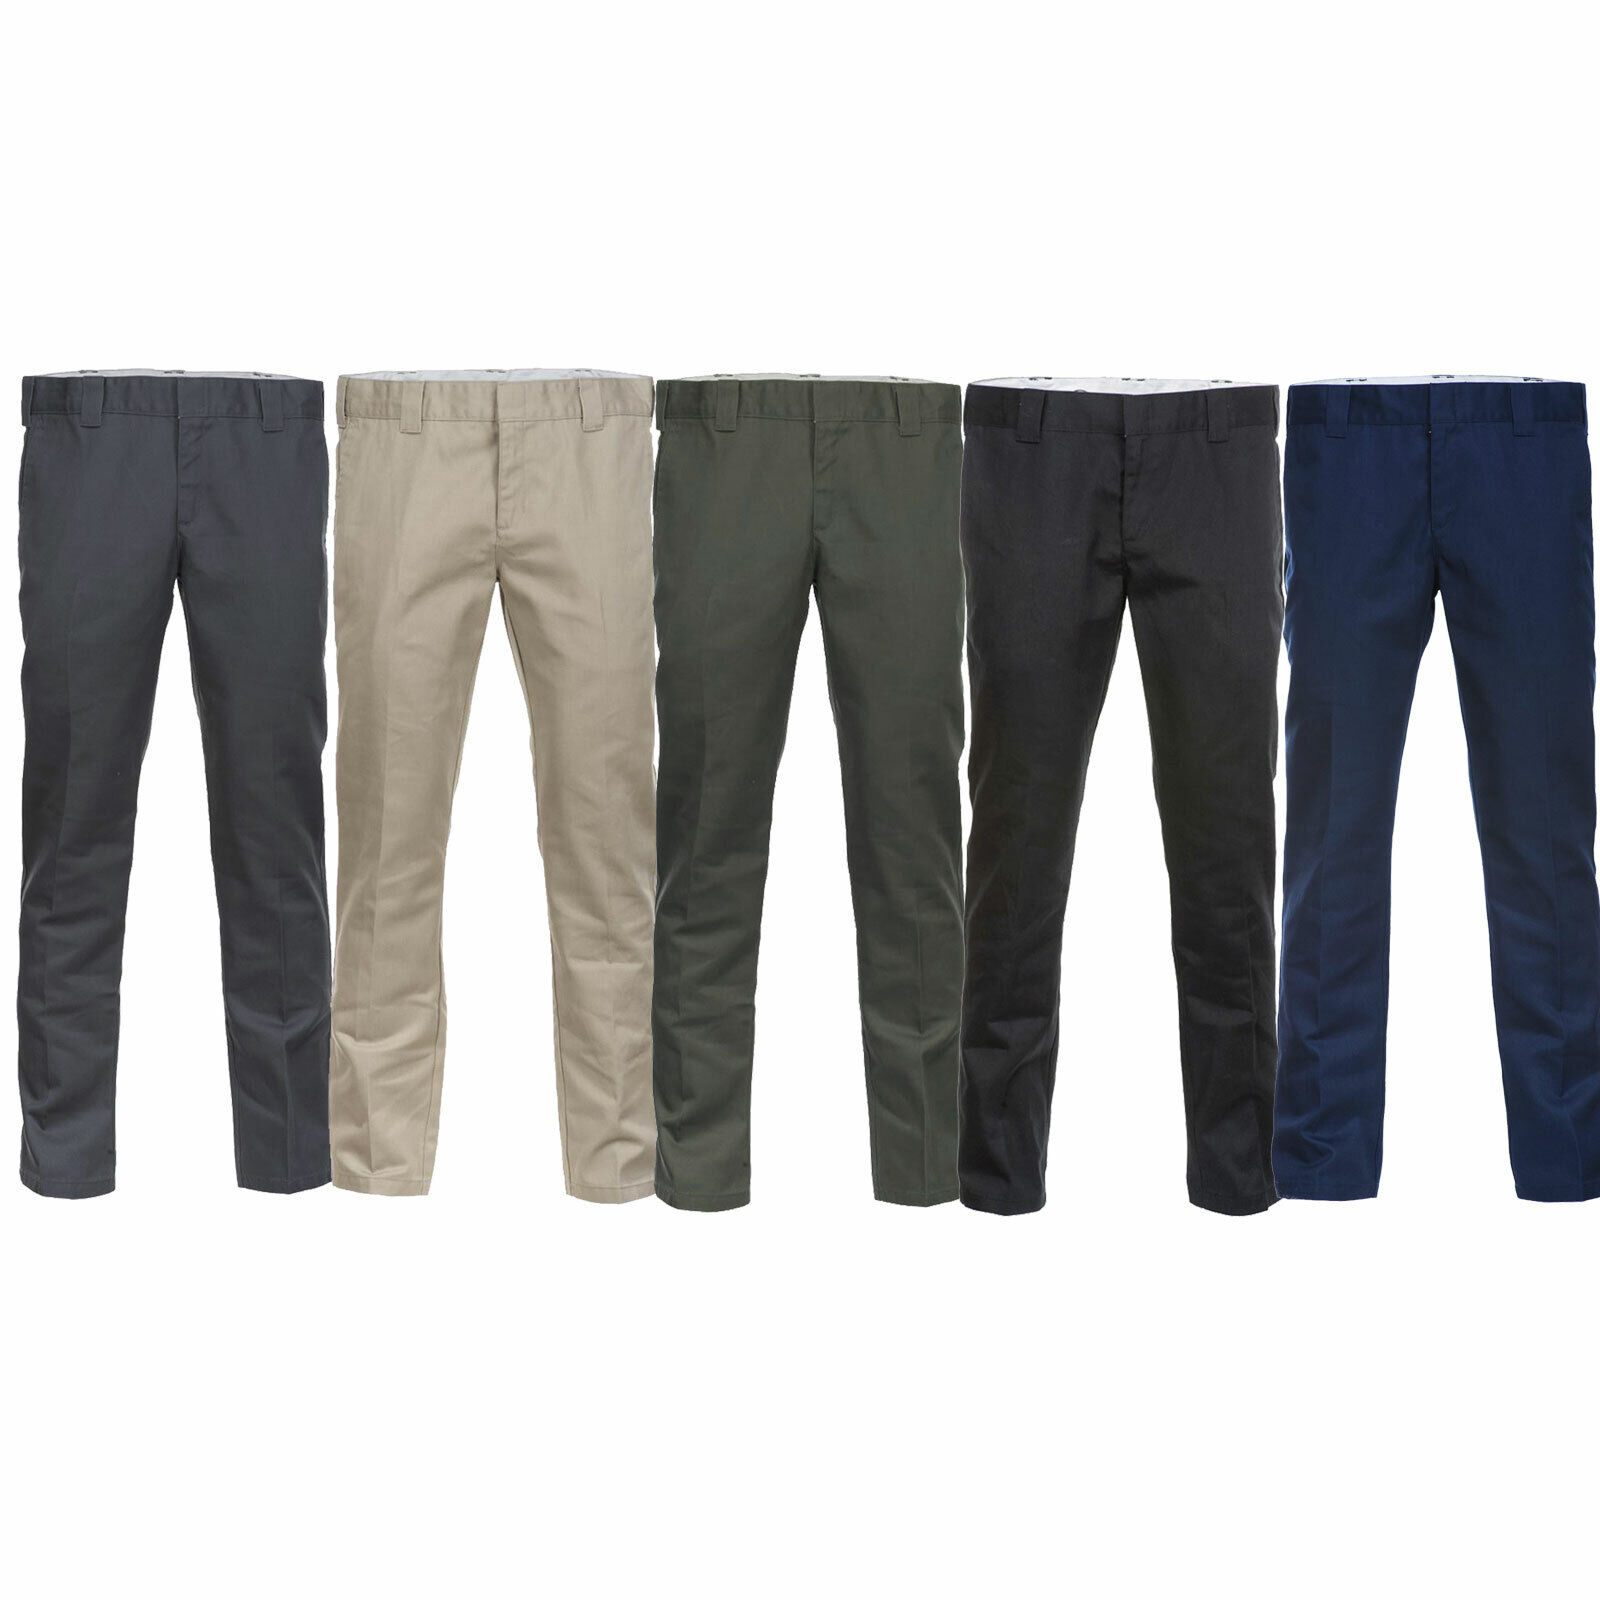 Dickies 872 Slim Fit Work Pant WE872 Men's Trousers Bügelfaltenhose Cloth New